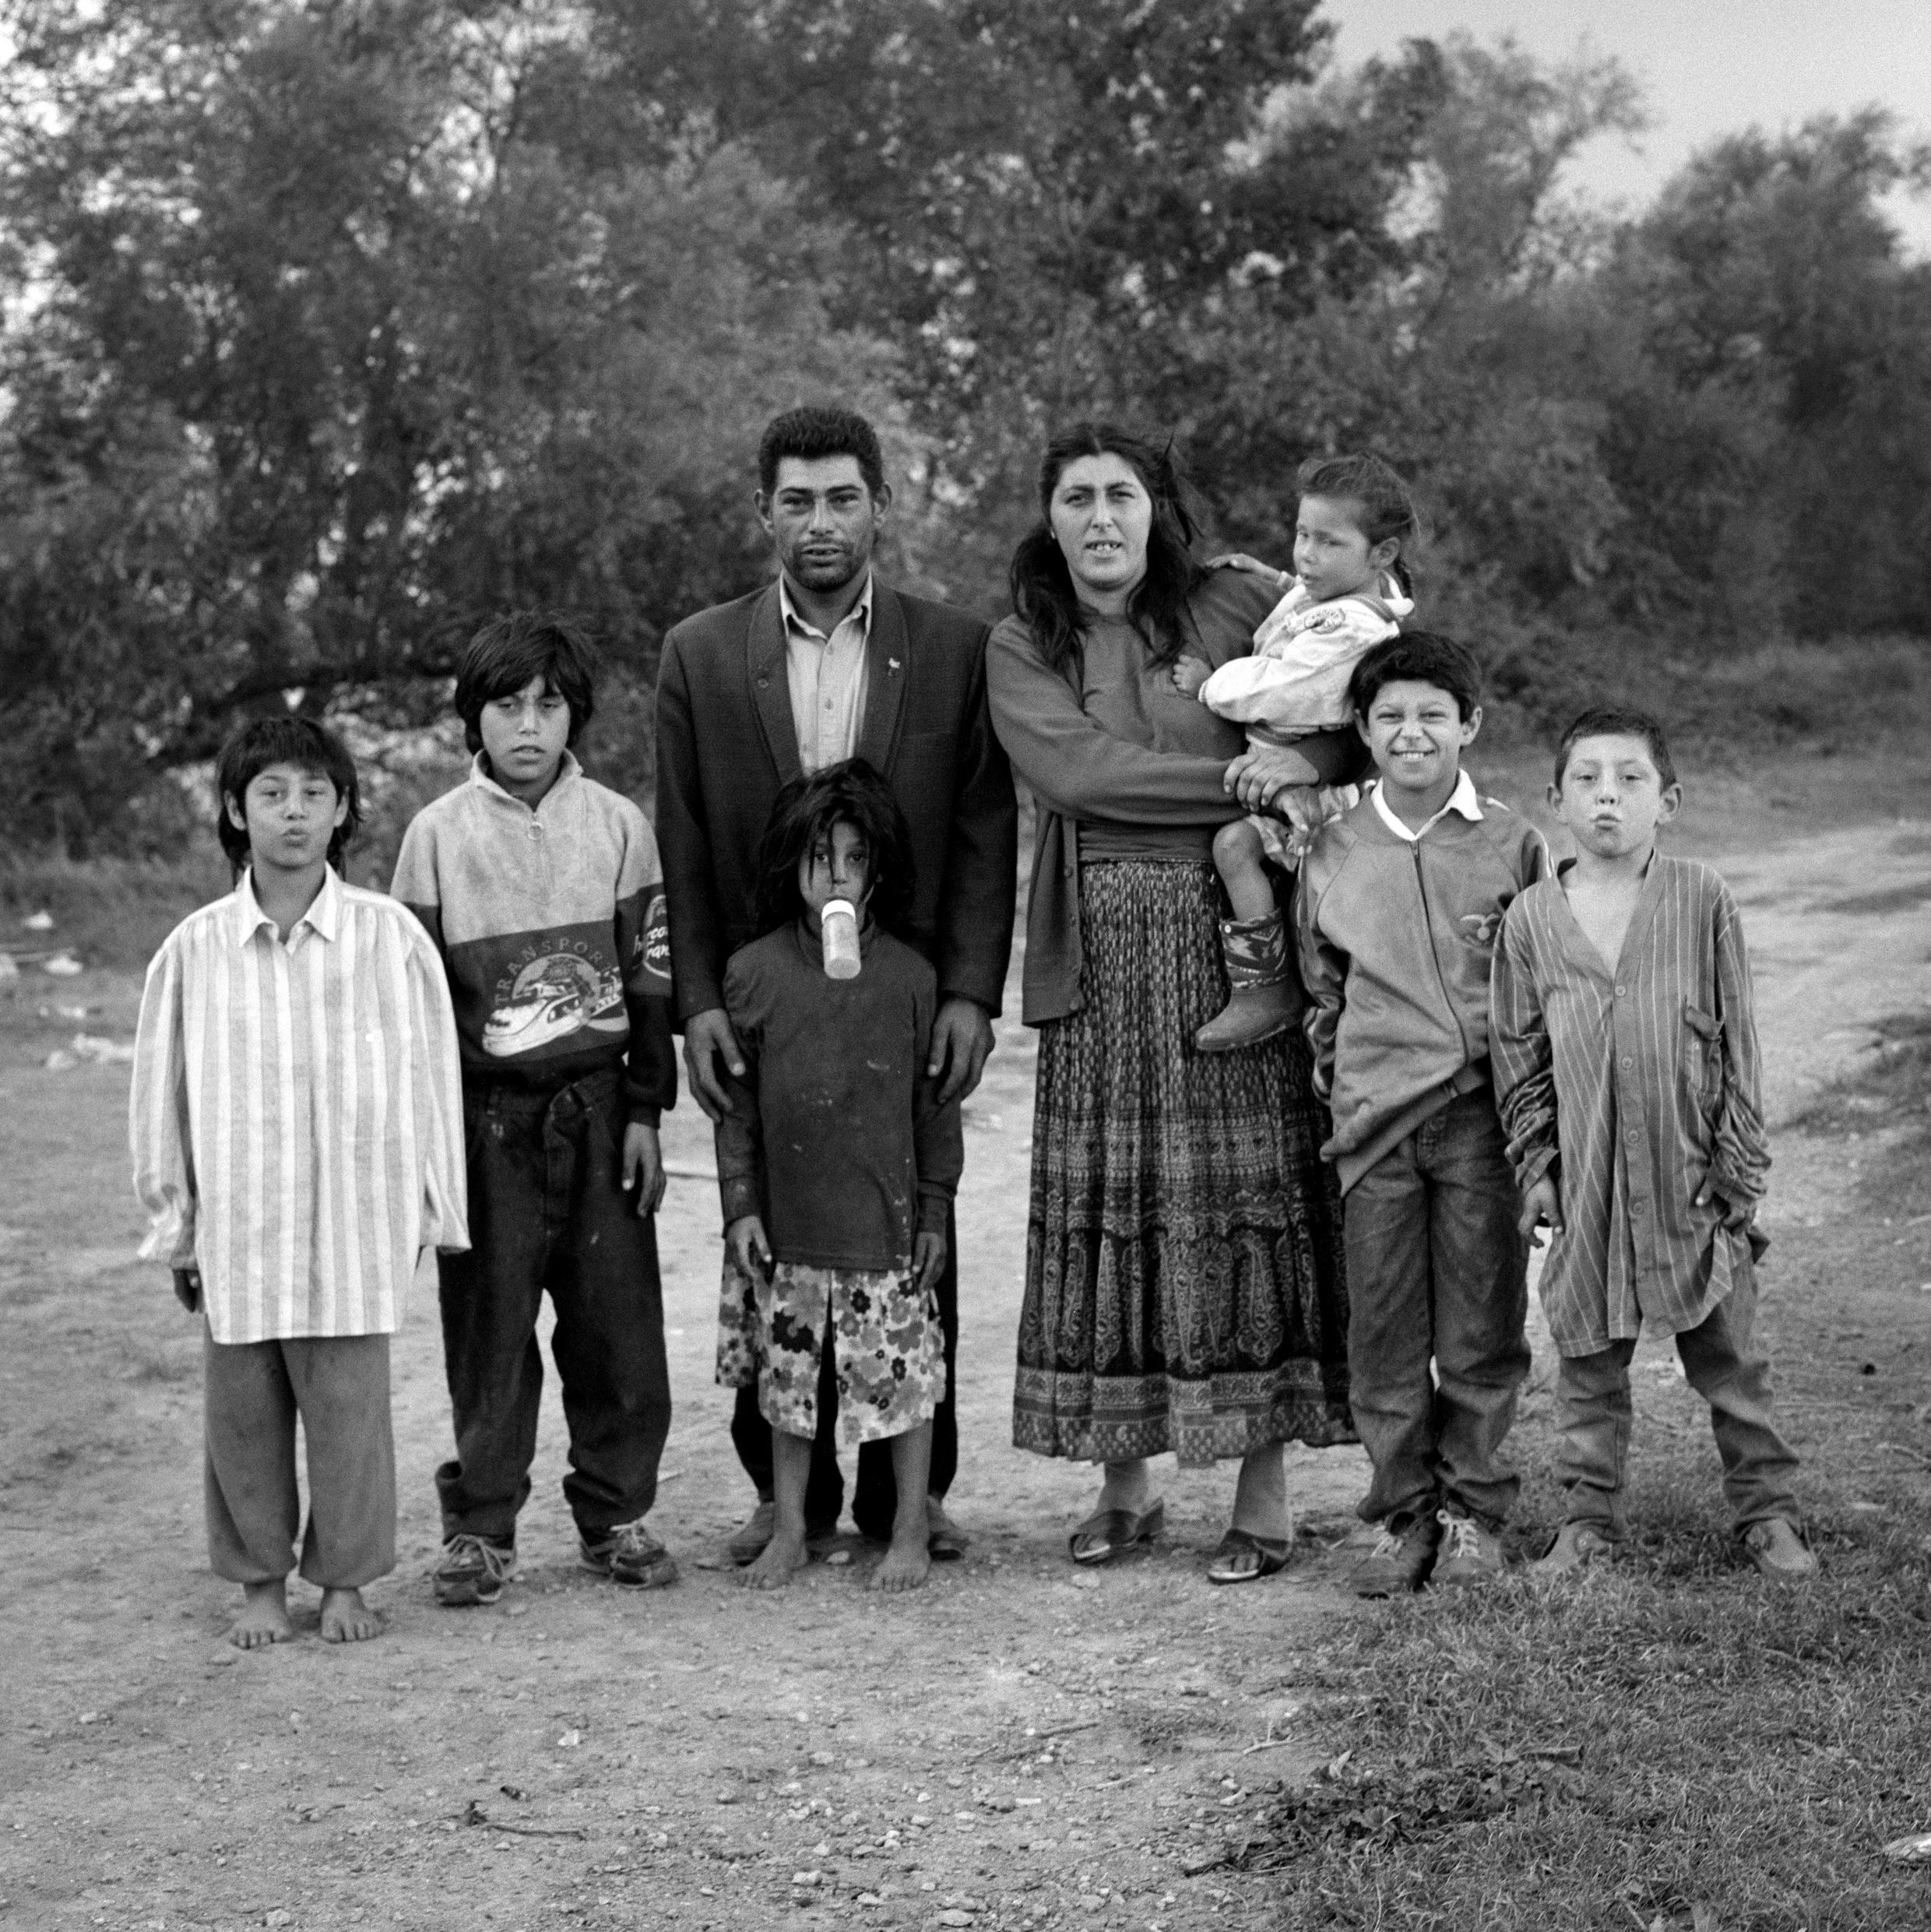 La famille Gorgan à Arles en 1995